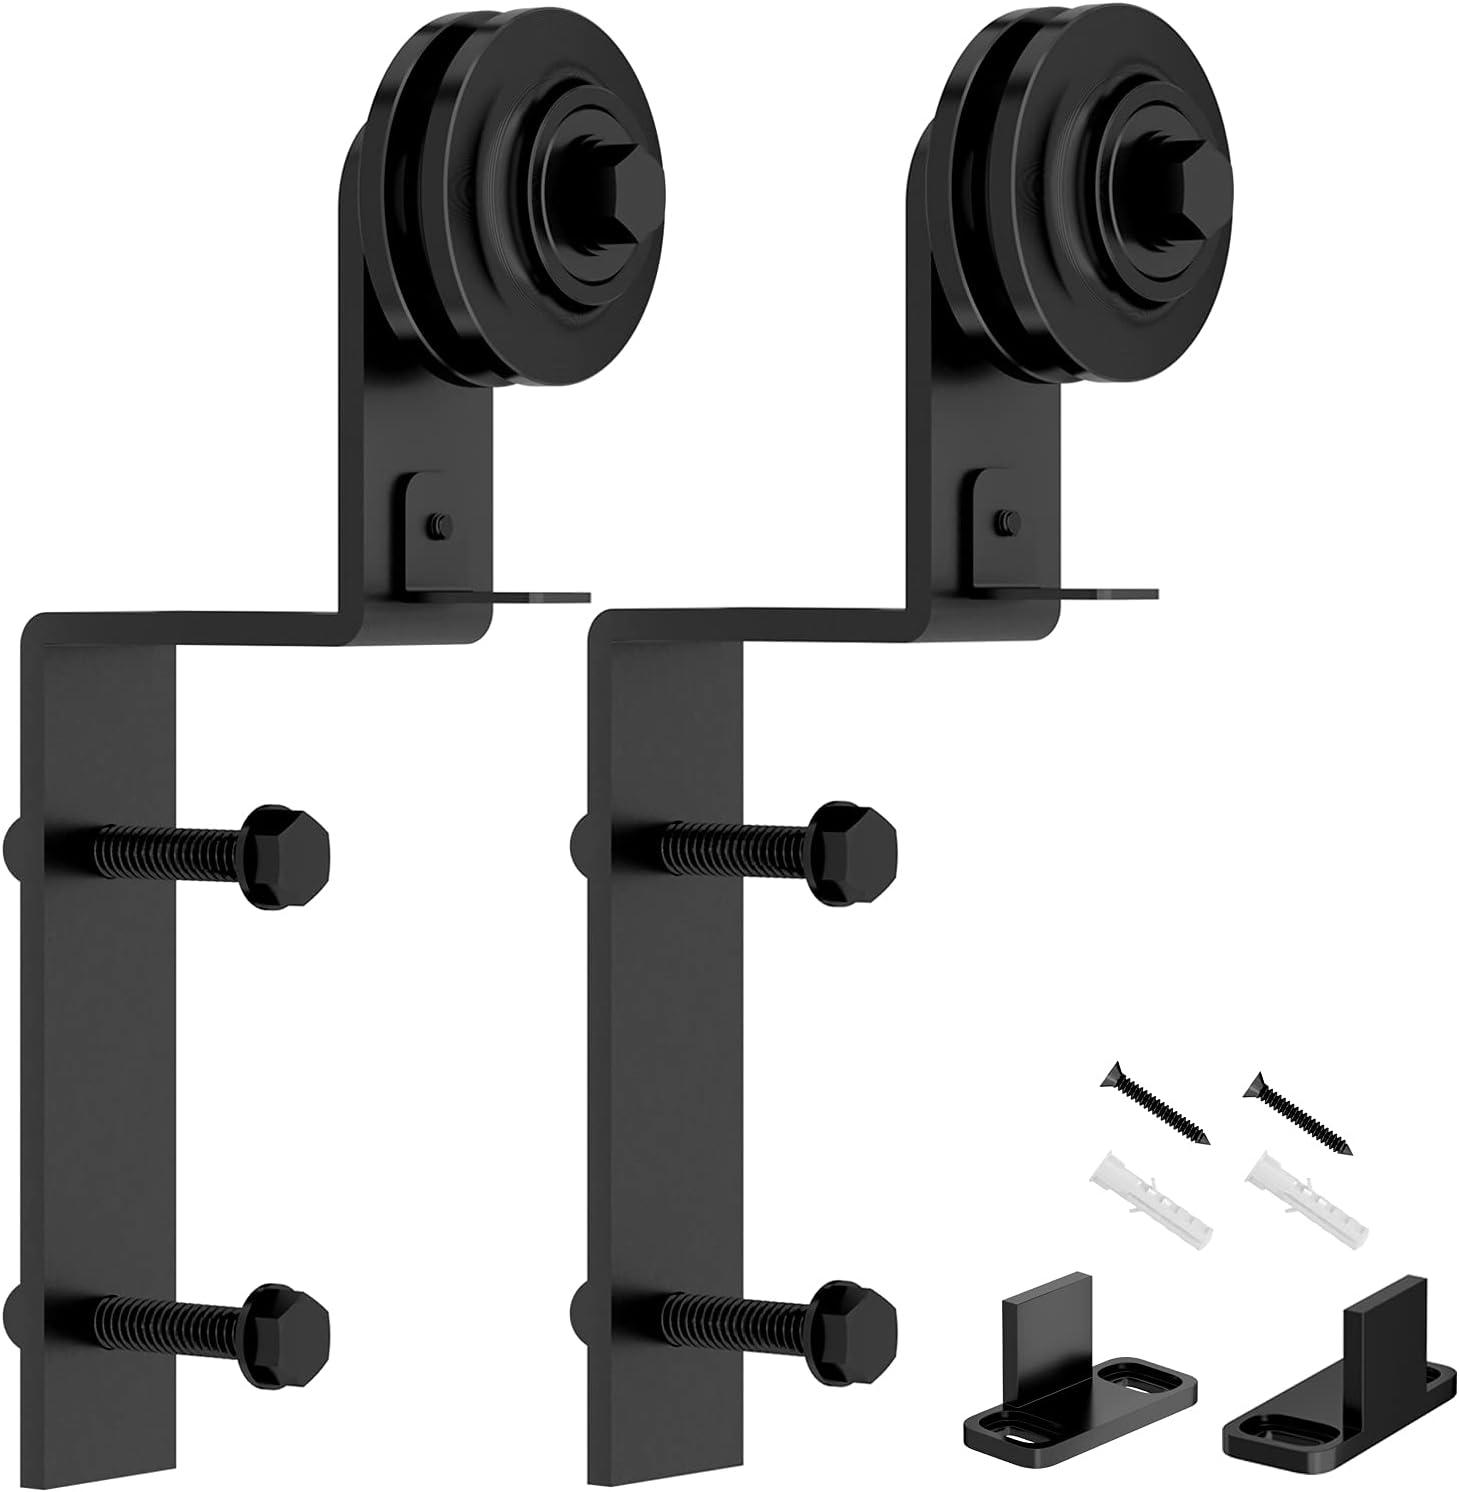 Barn Door Sliding Hardware Hangers 2pcs S Bypass Safety and trust Bent I Regular discount Black